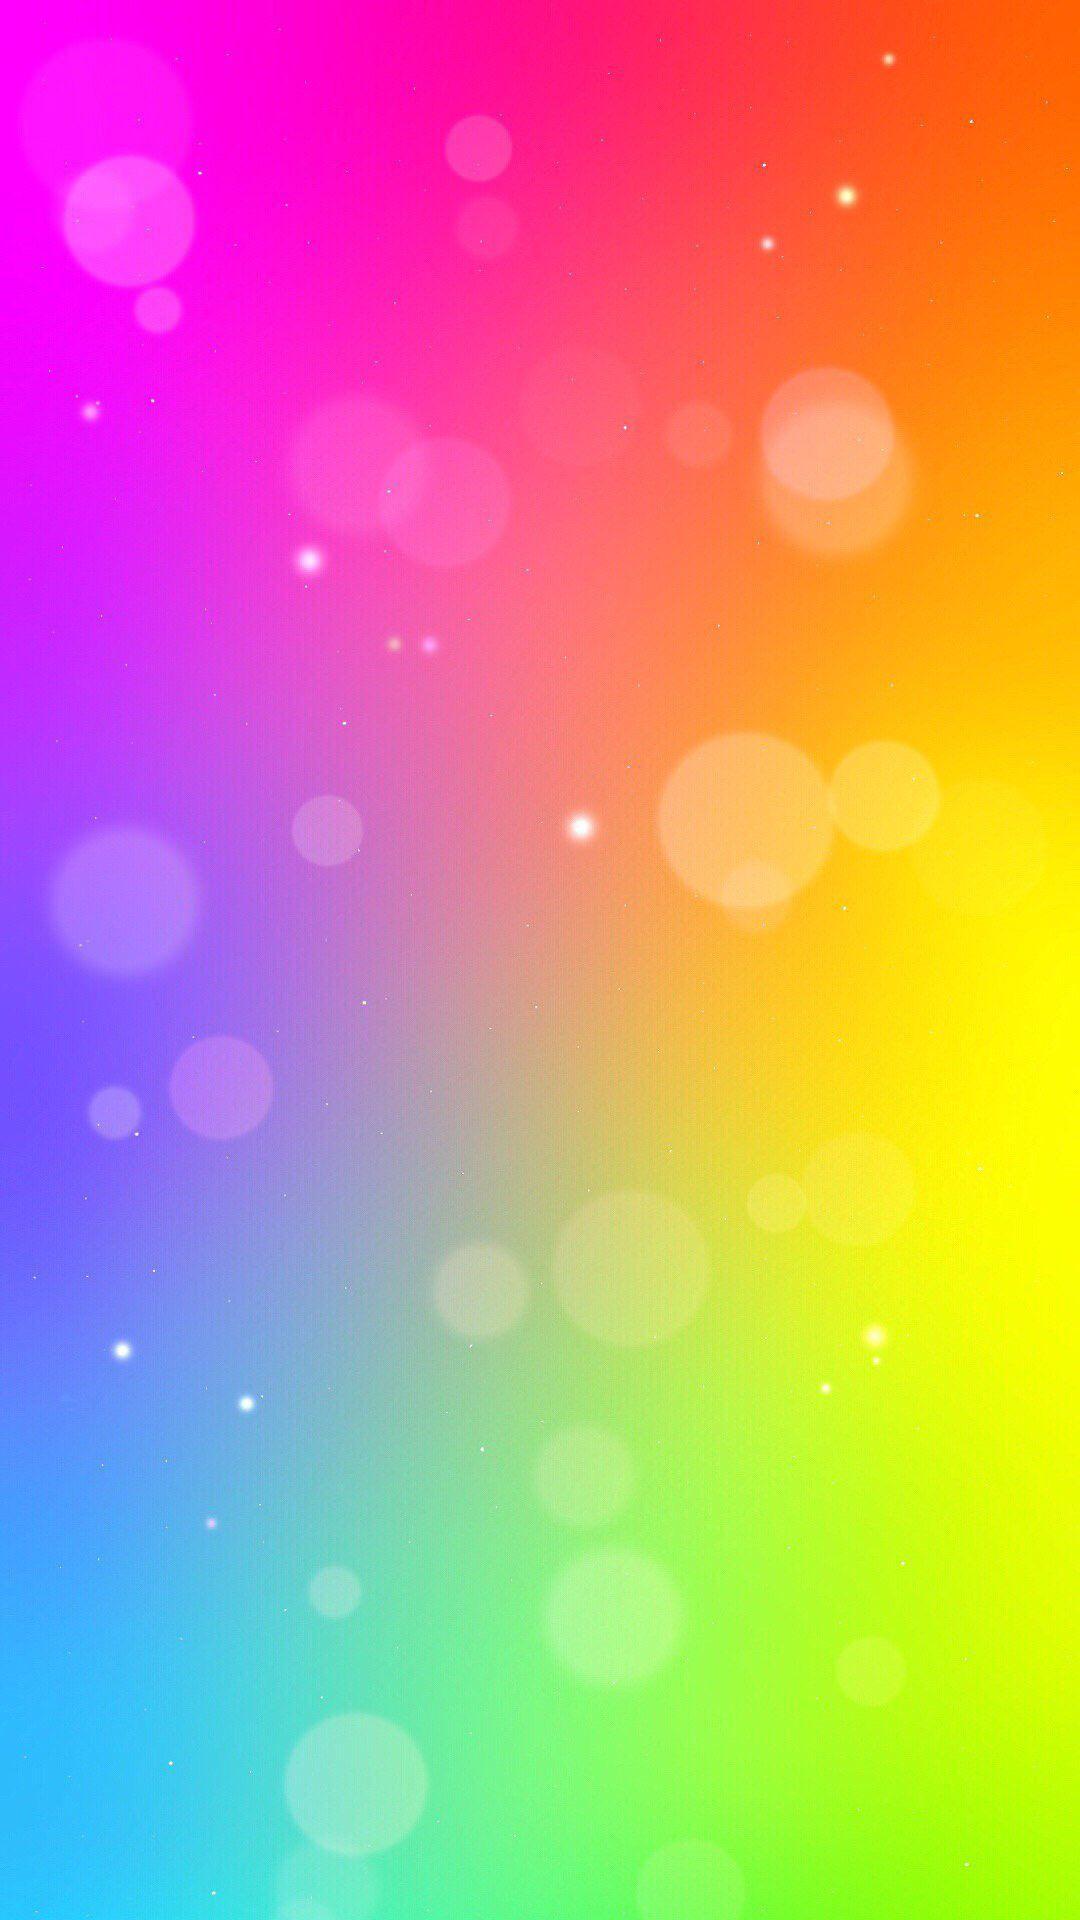 Beautiful Colors Background - HD Wallpaper